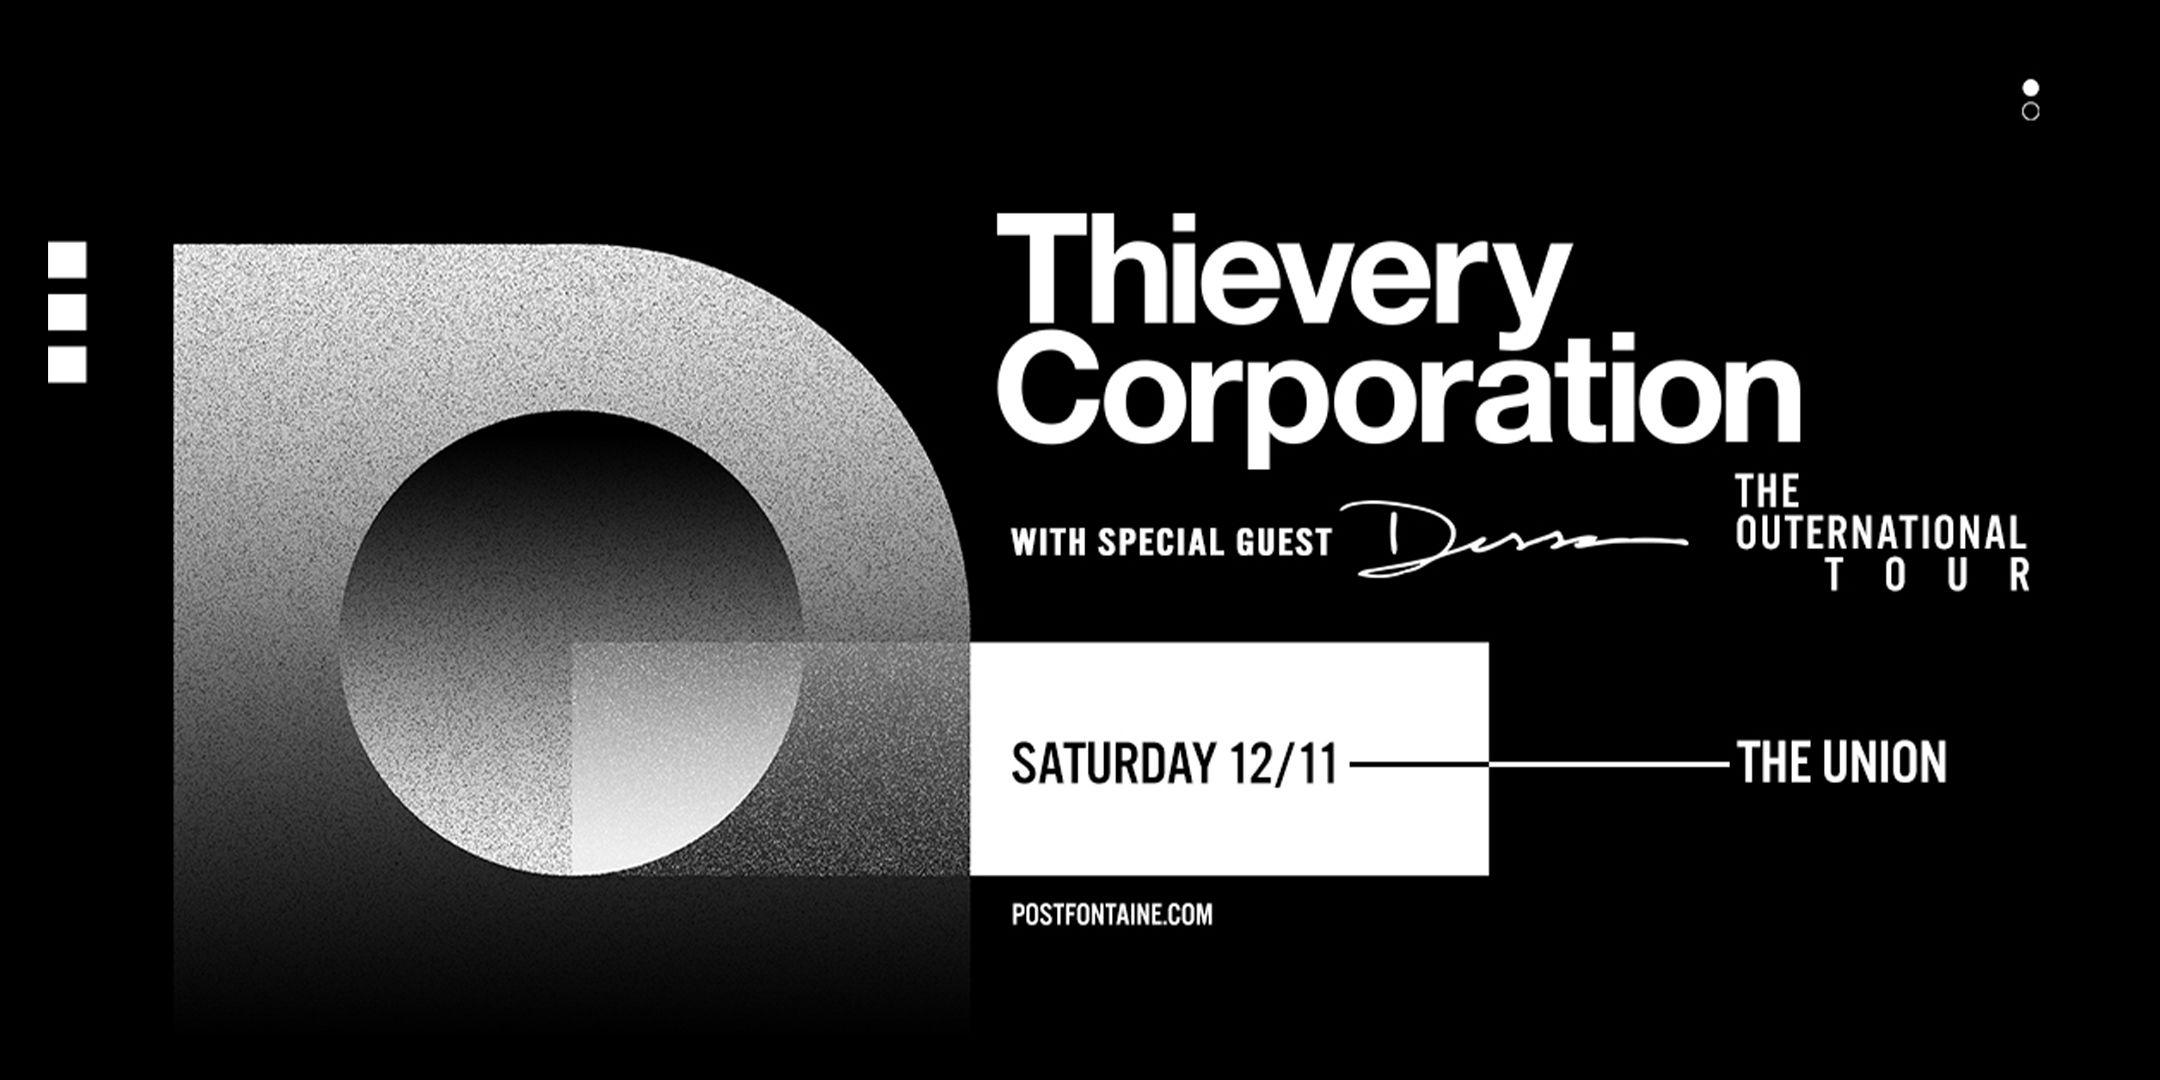 thievery_corporation_banner.jpg